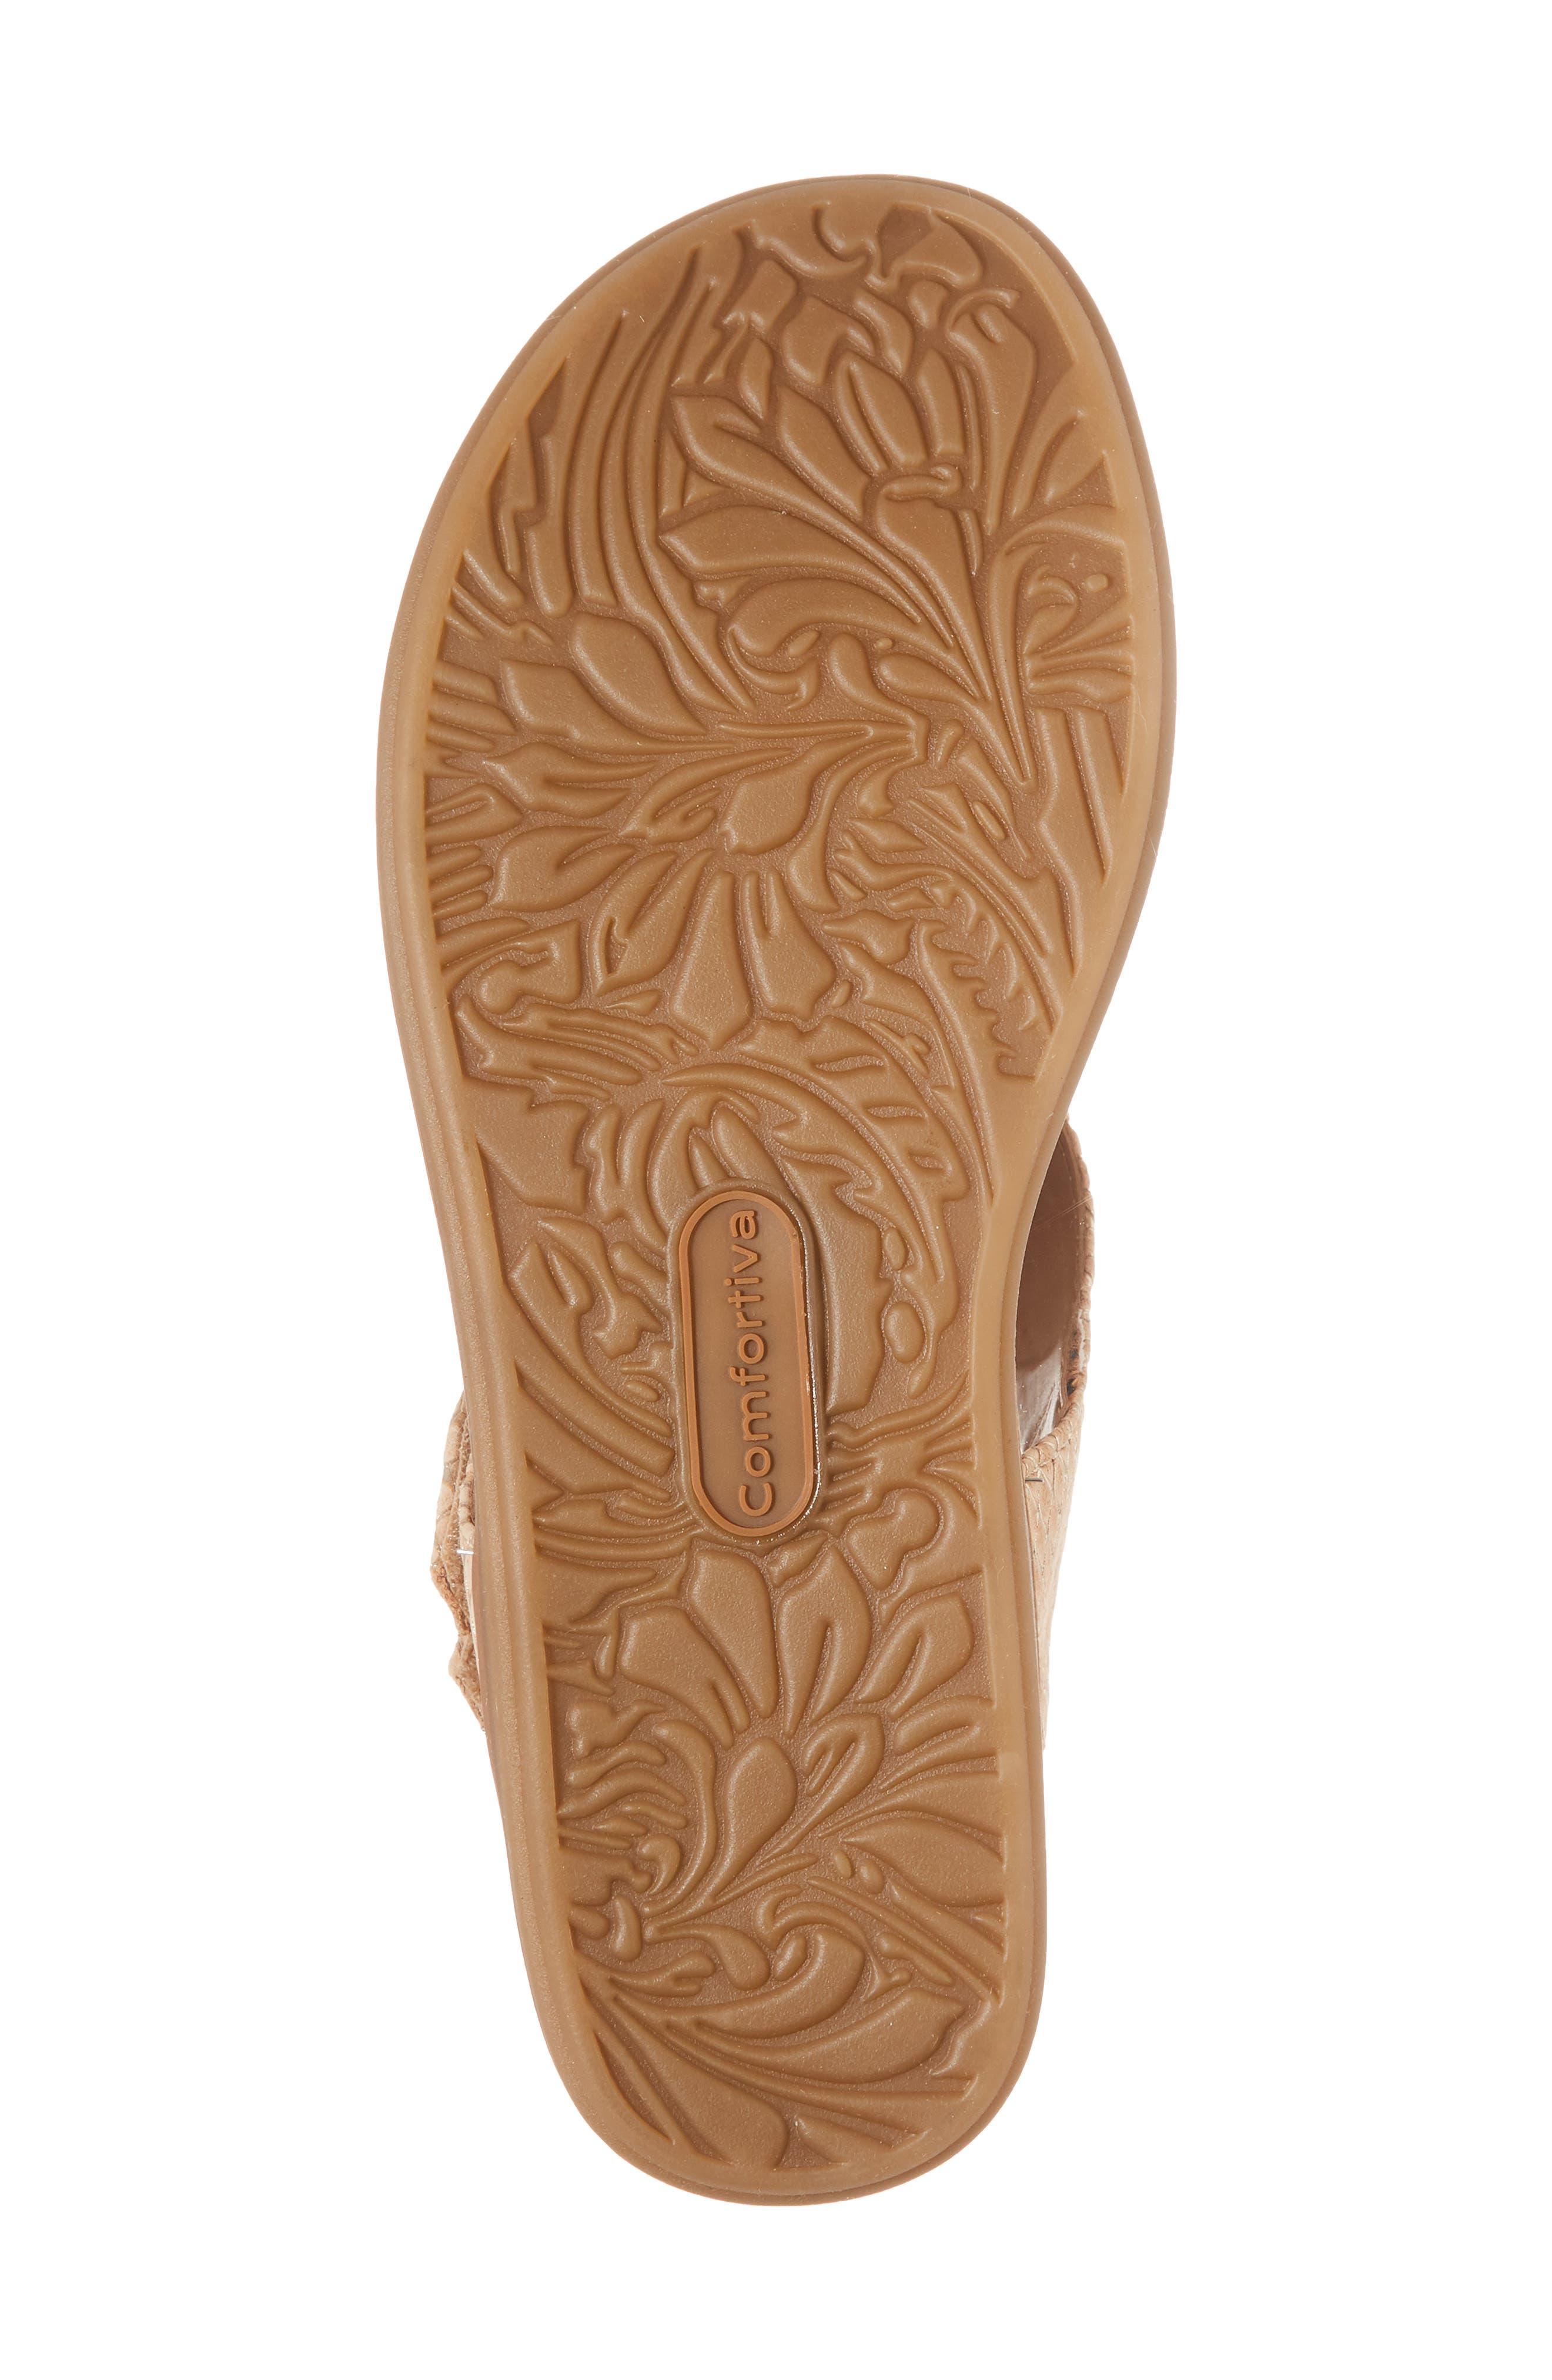 Calina Sandal,                             Alternate thumbnail 6, color,                             Sand Nubuck Leather